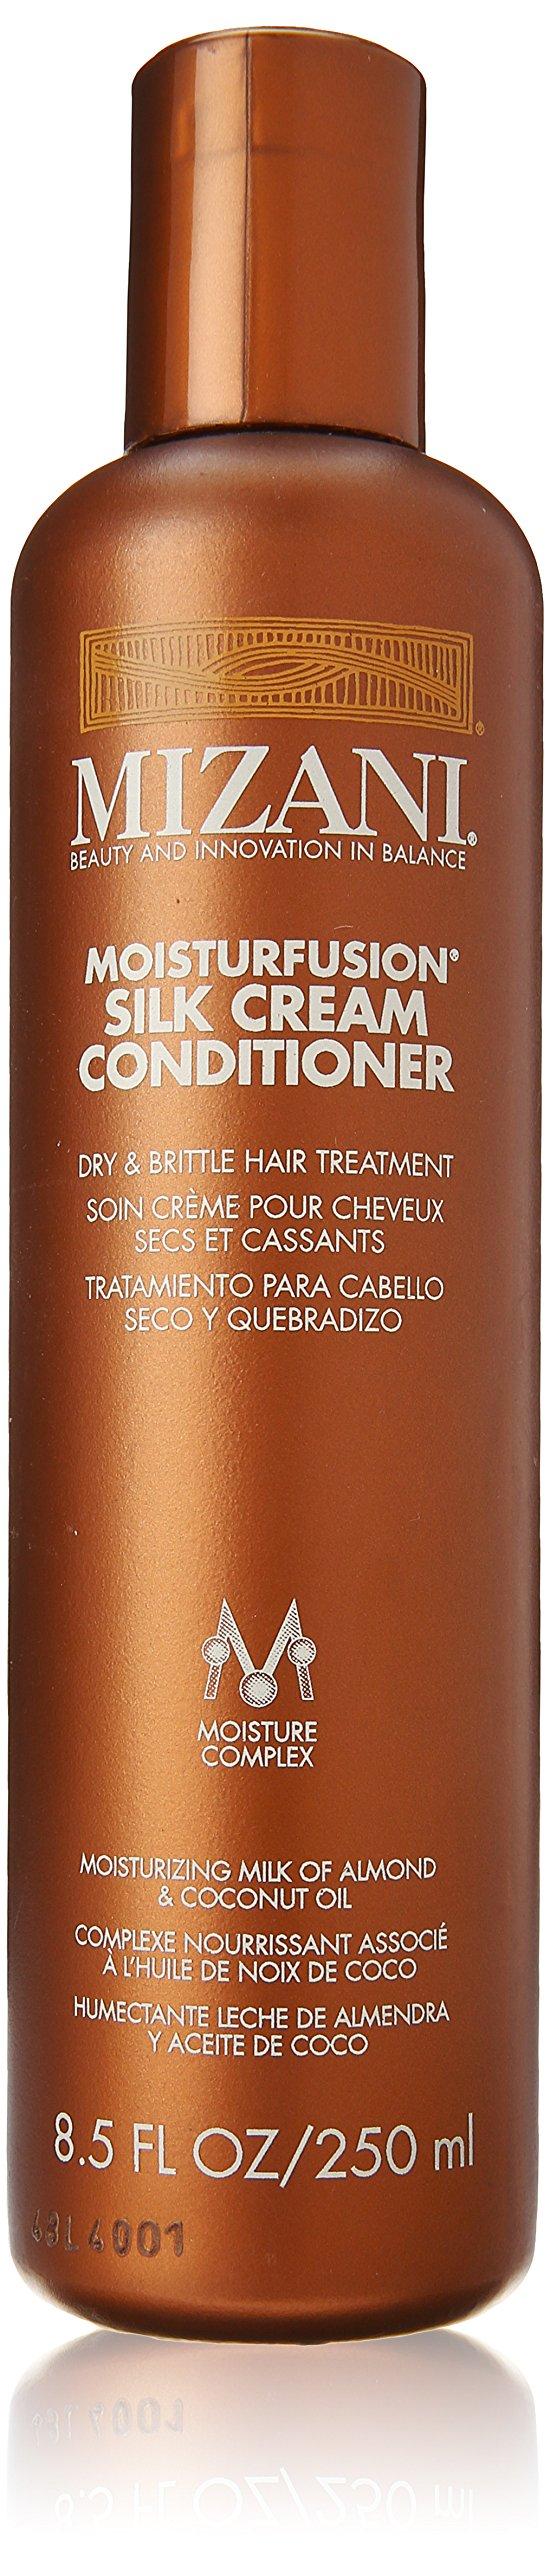 Mizani Moisturfusion Silk Cream Conditioner for Unisex, 8.5 Ounce